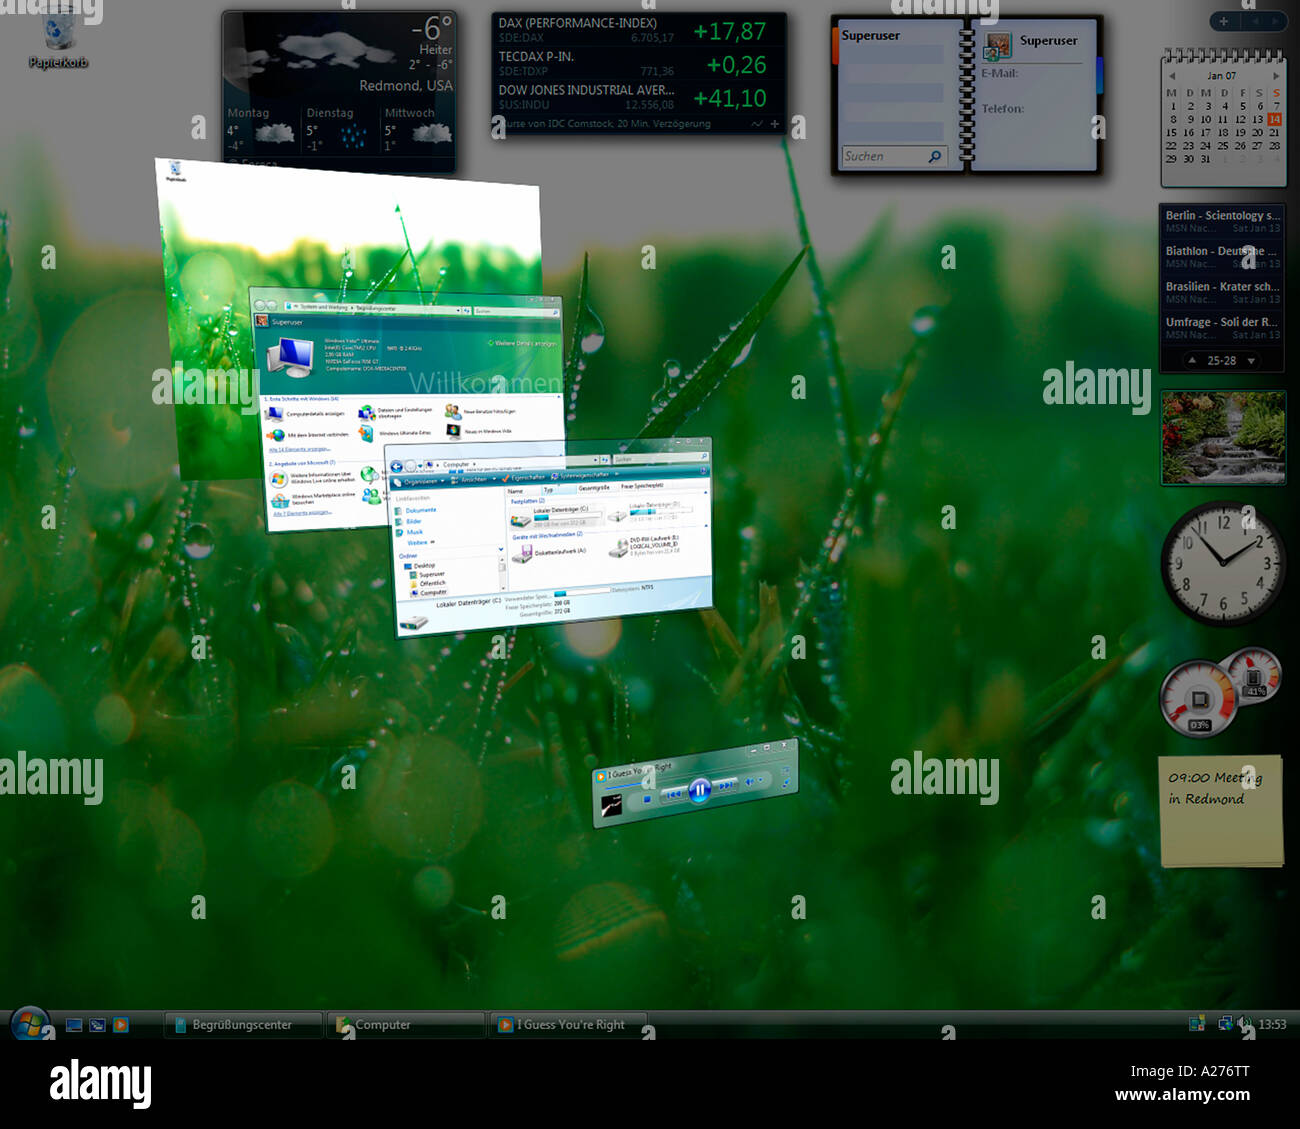 Microsoft Windows Vista, german version, desktop with perspectively arranged applications, screenshot - Stock Image